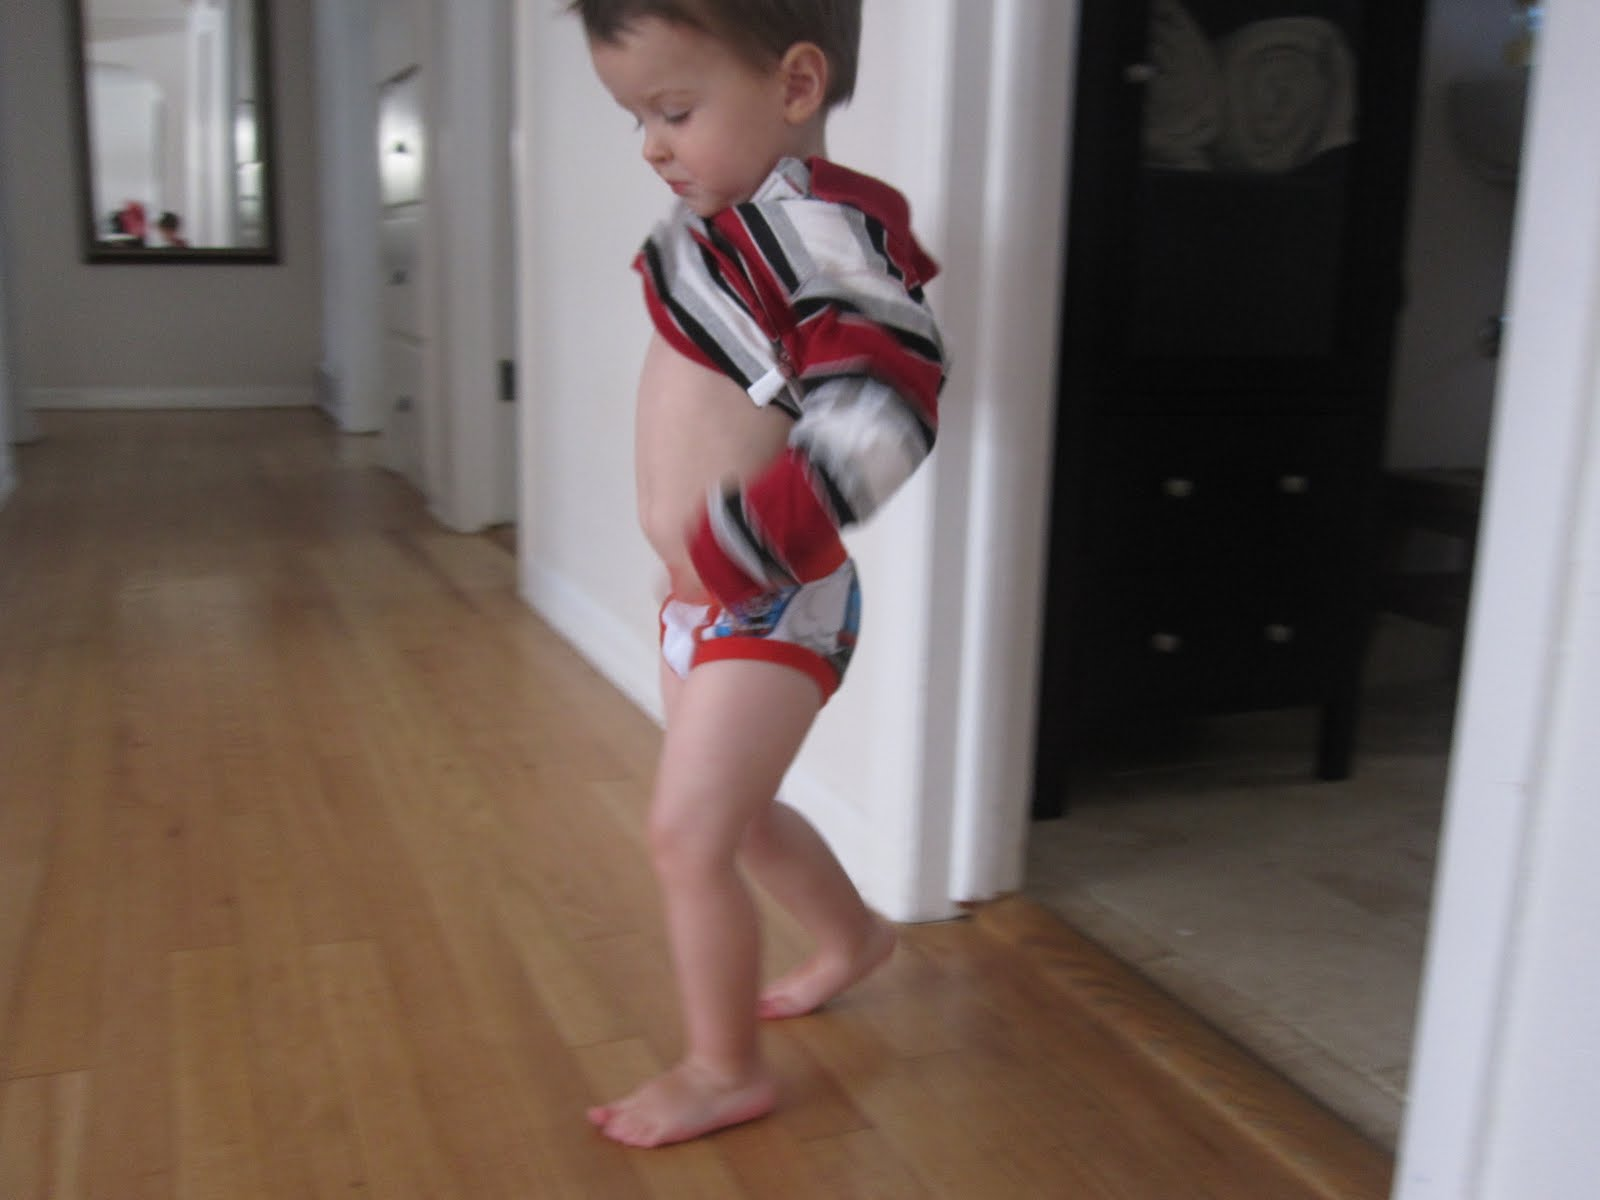 A Day Out in Big-Boy Underwear